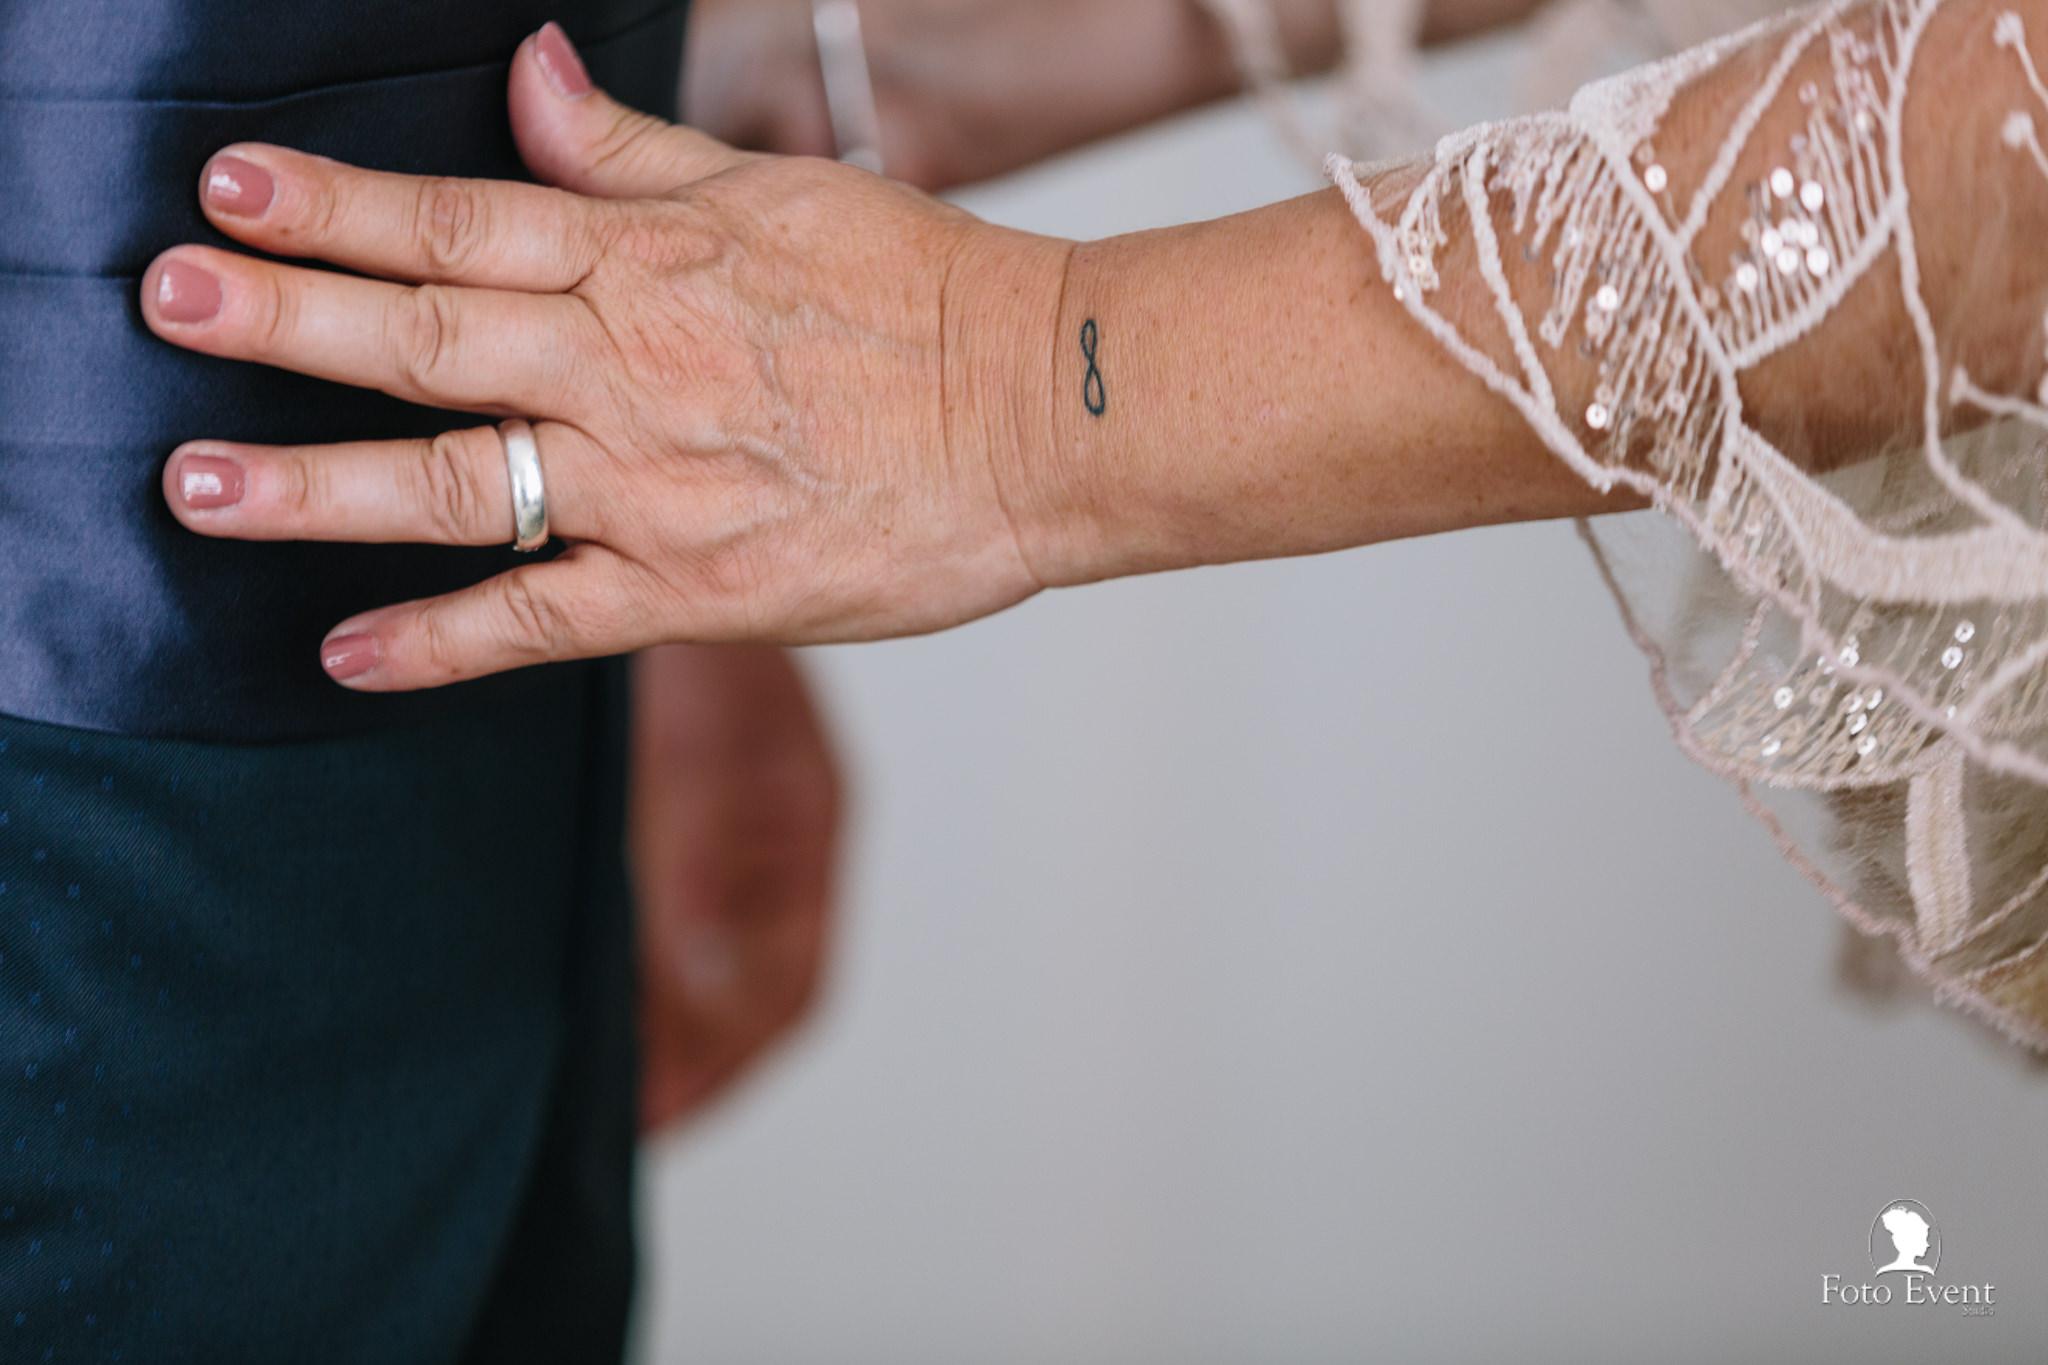 003-2019-08-31-Matrimonio-Serena-e-Saverio-Tarantino-zoom-031